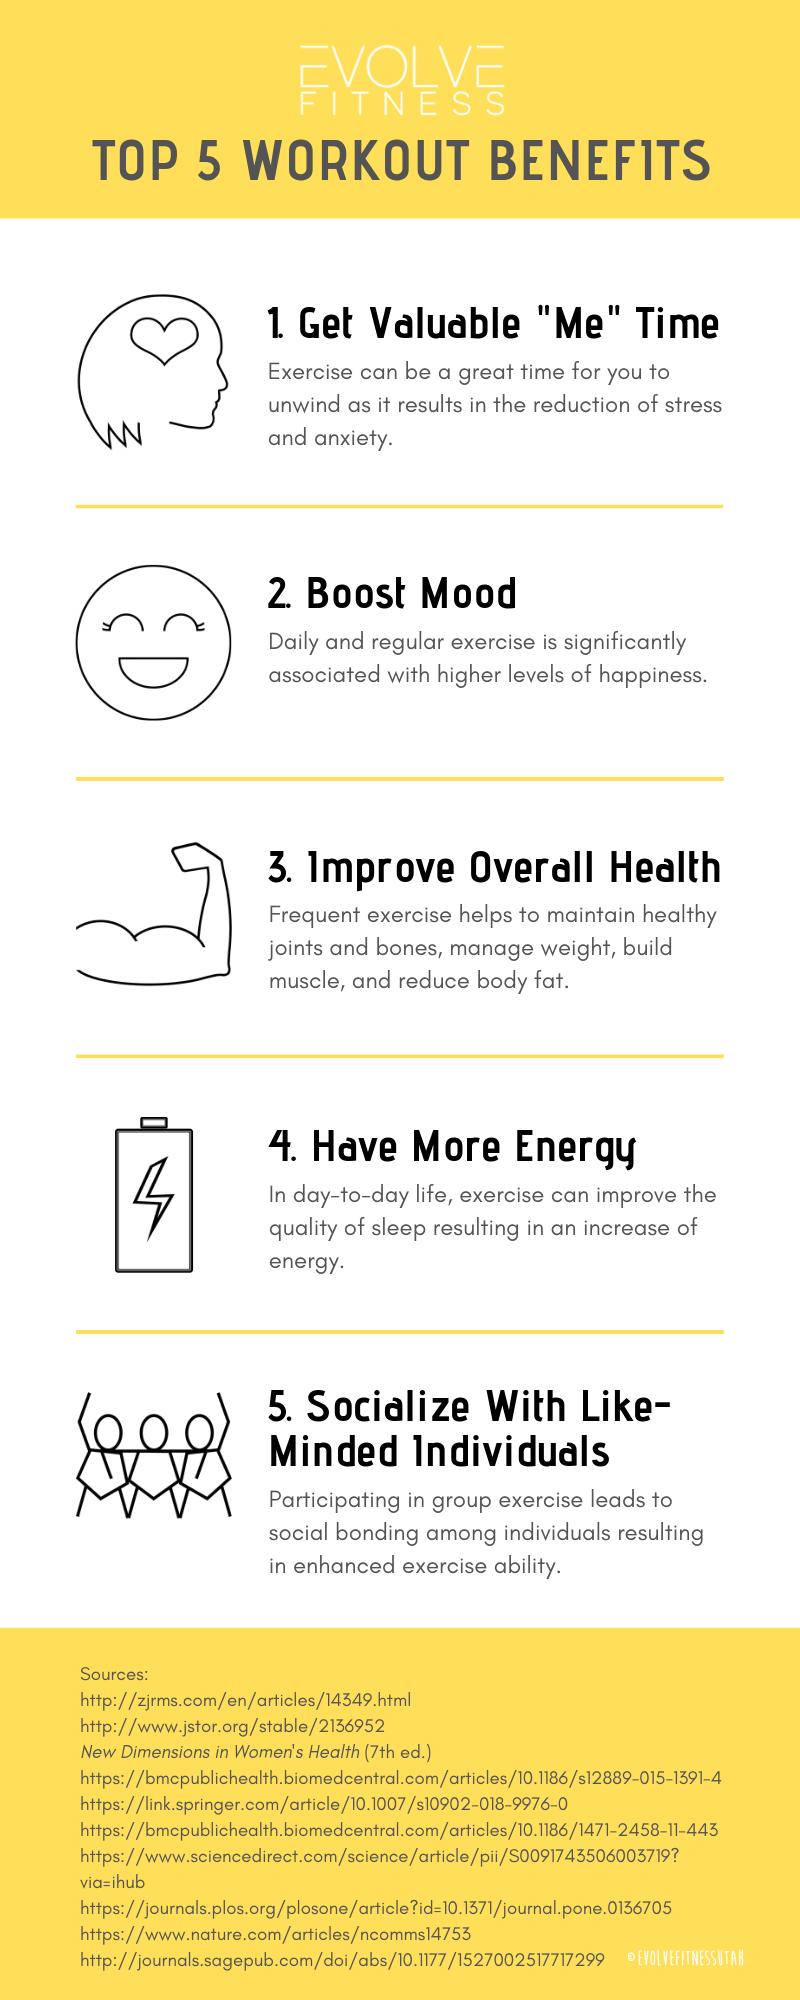 Top 5 Workout Benefits Infographic ©EvolveFitnessUtah